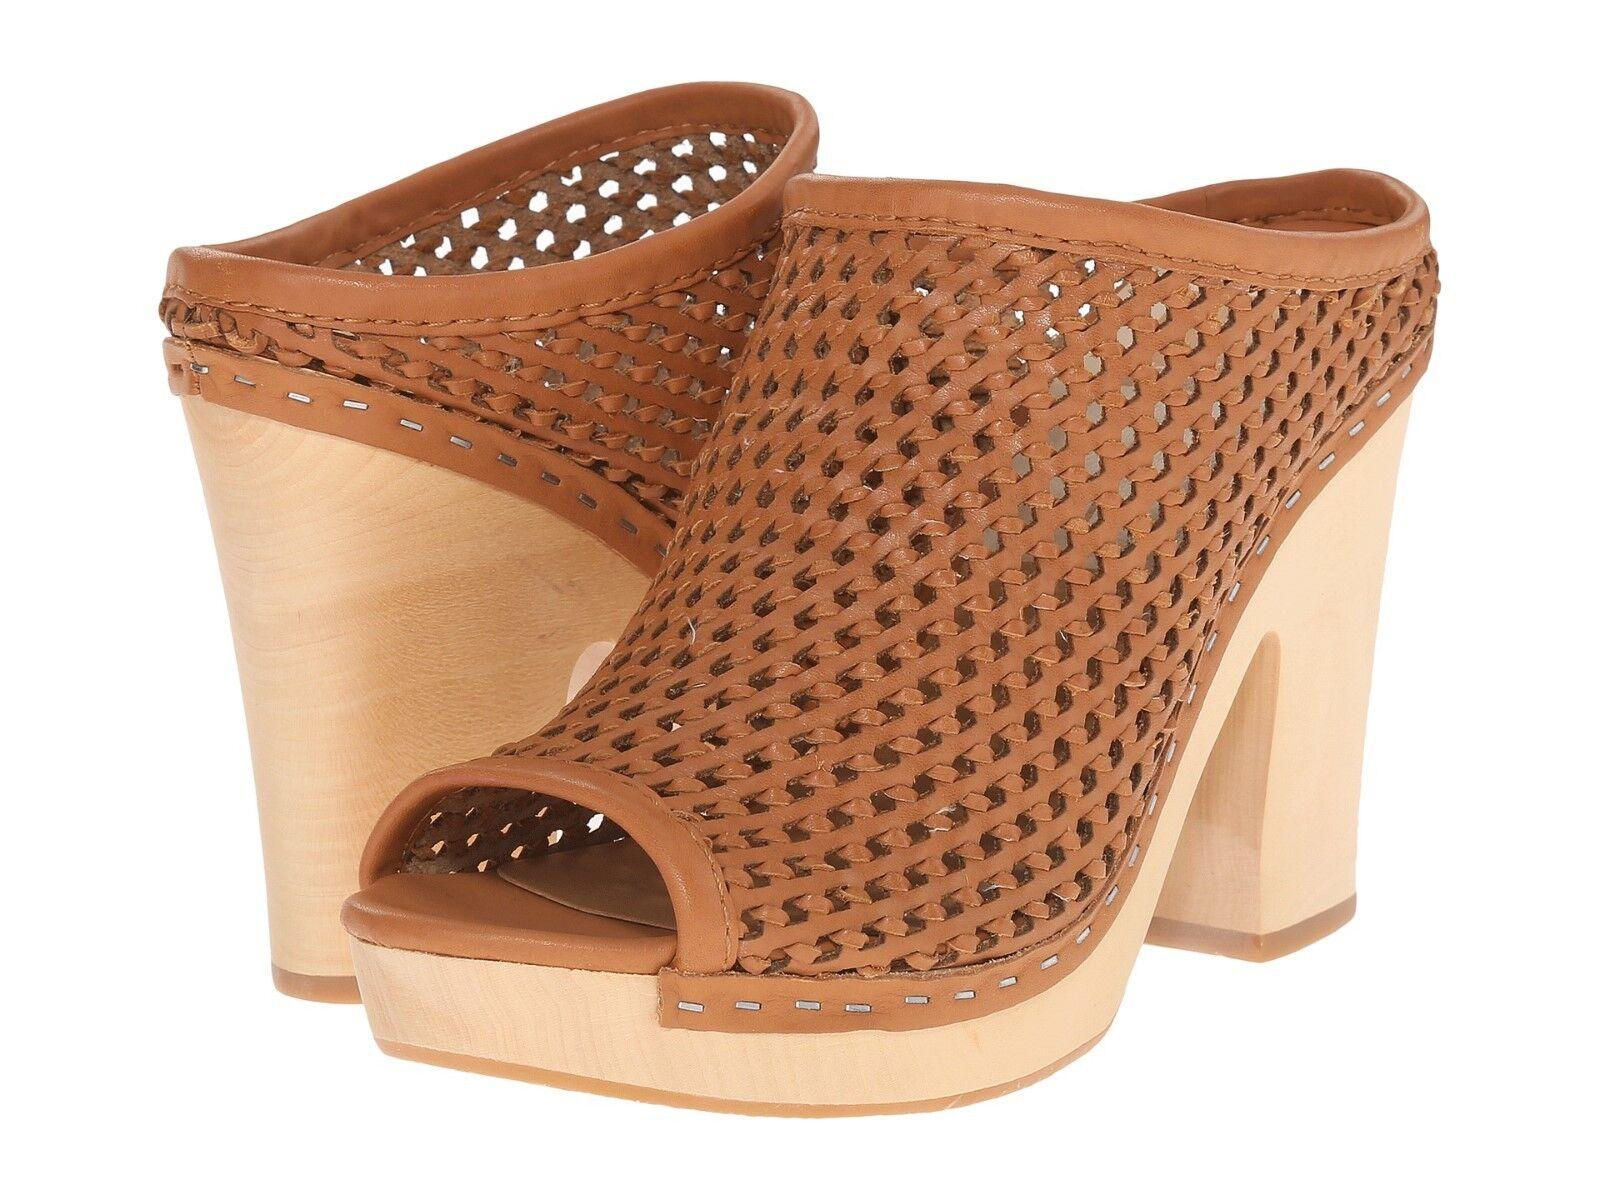 NEU Dolce Vita BROOKS Clog NIB Woven Leder Platform Wedge Mule Tan 1011 220